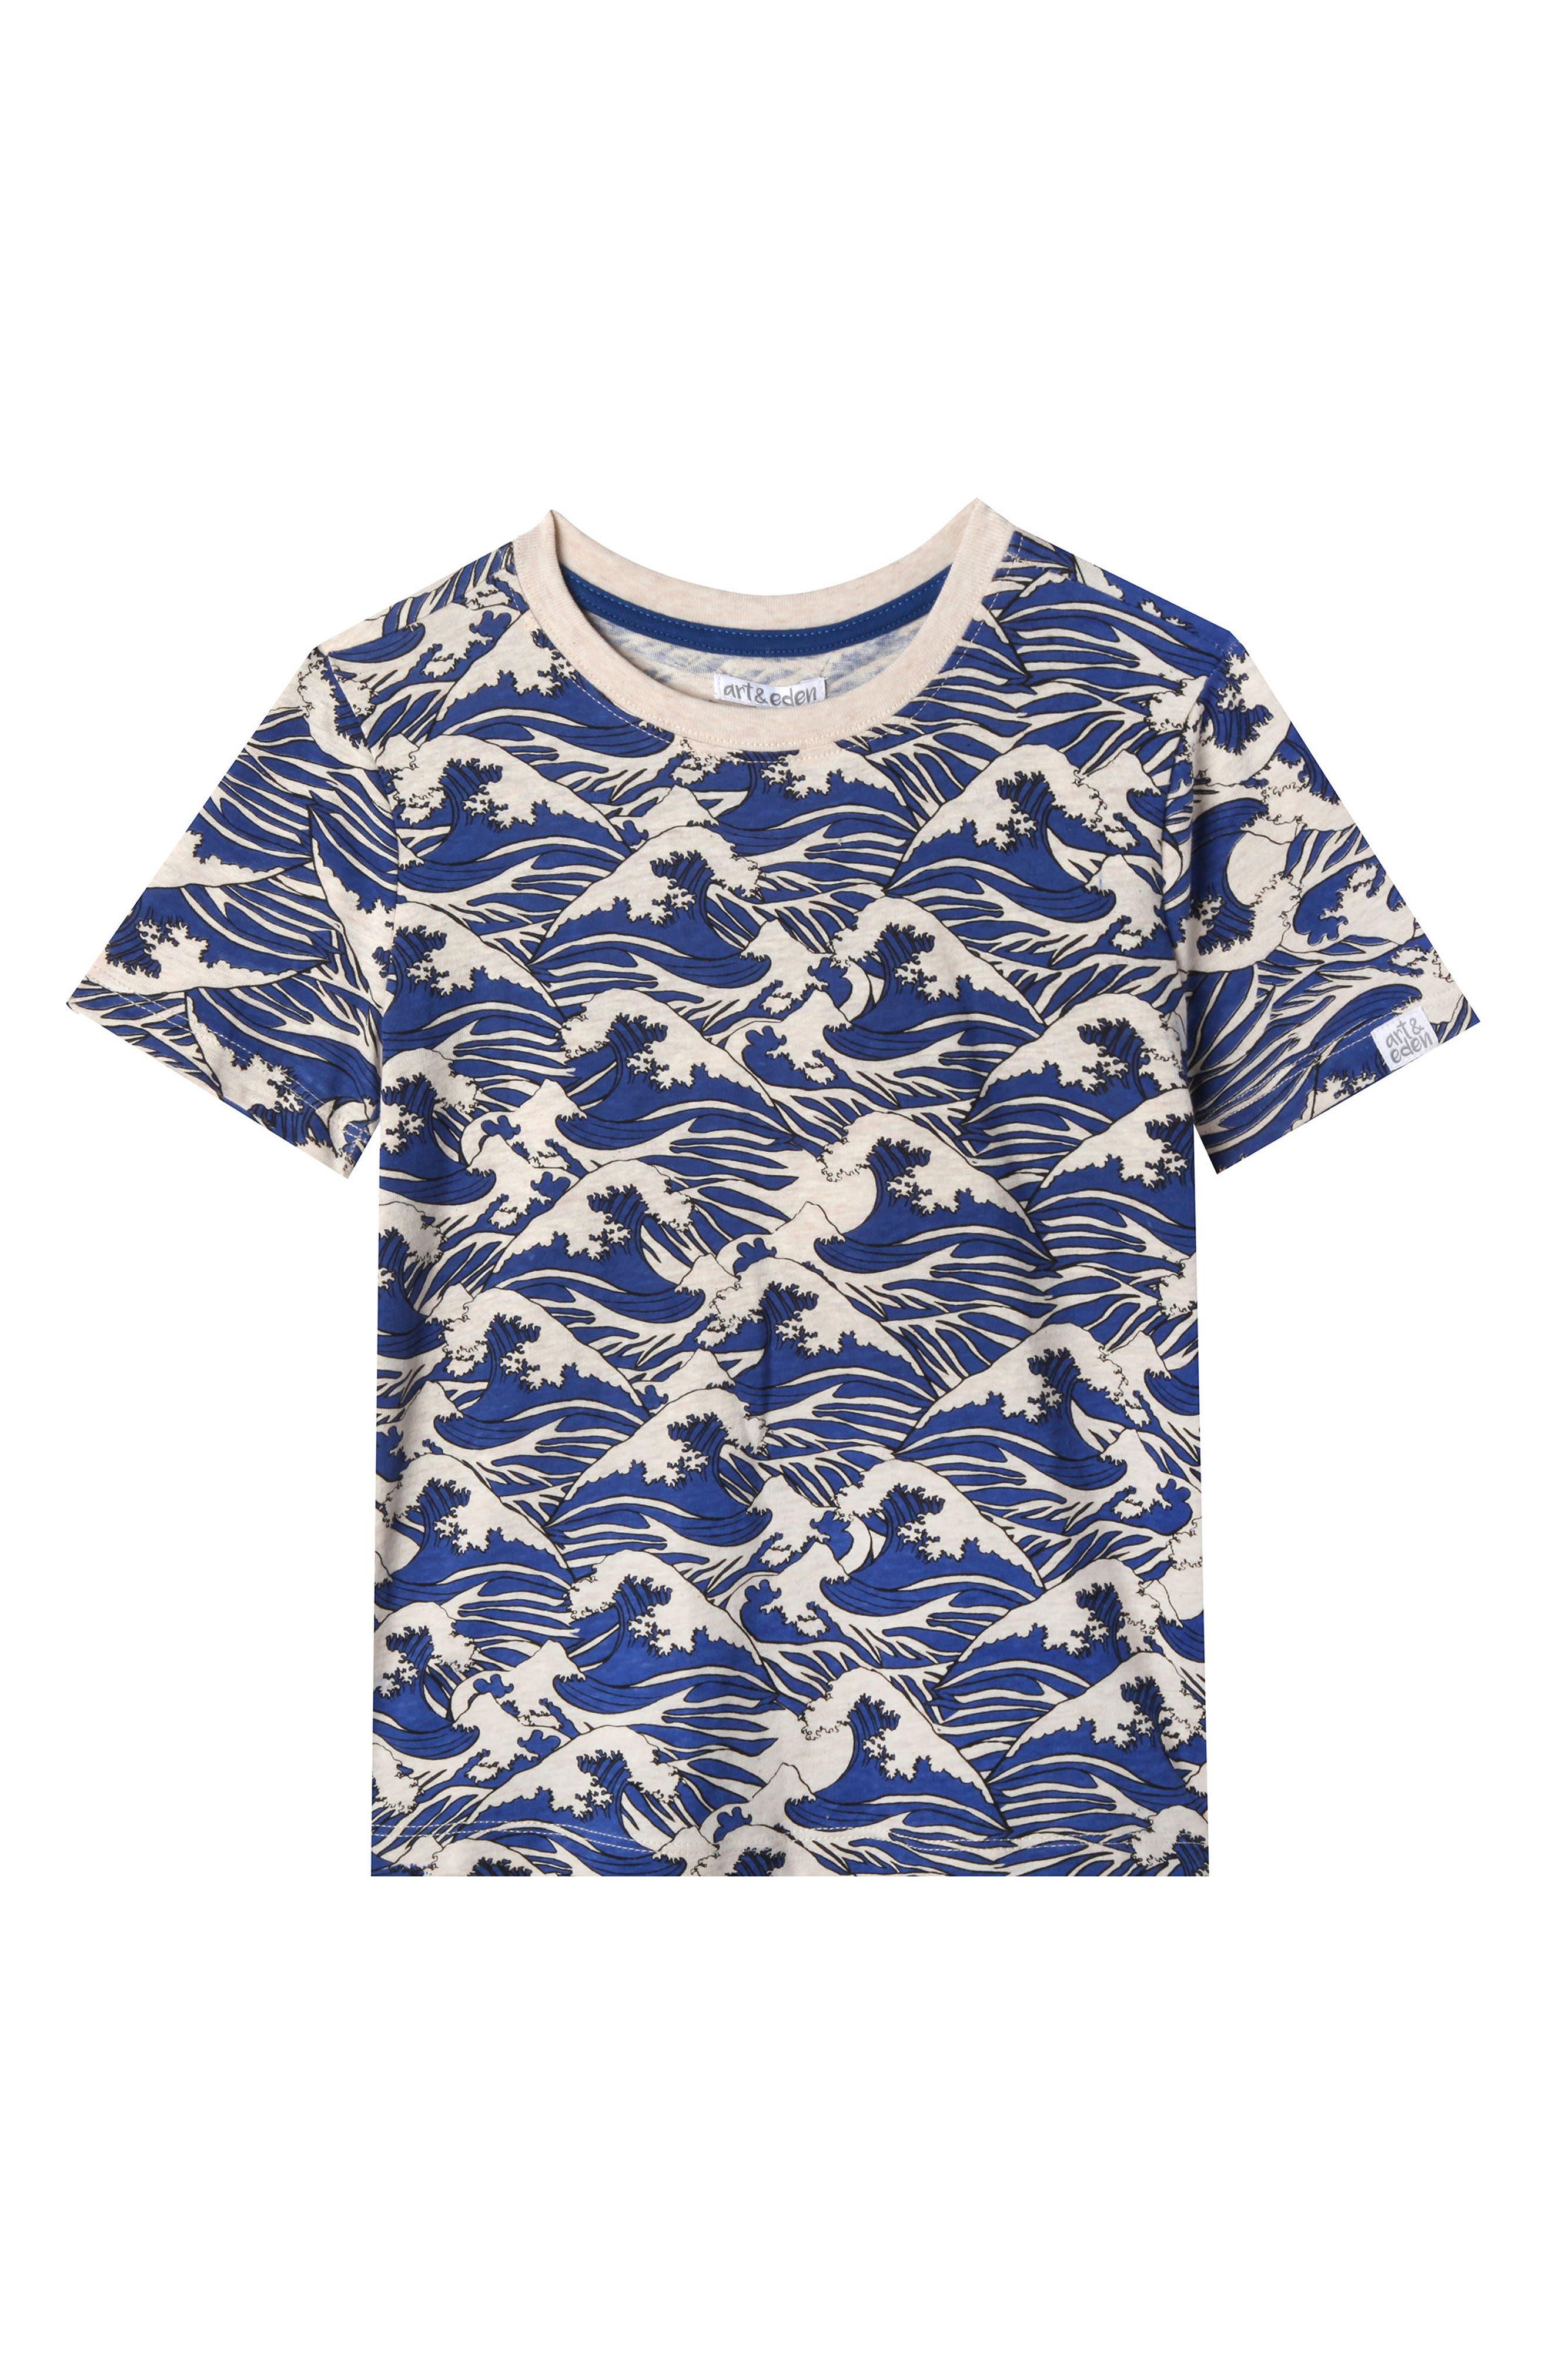 David Ocean Waves Organic Cotton T-Shirt,                             Main thumbnail 1, color,                             260